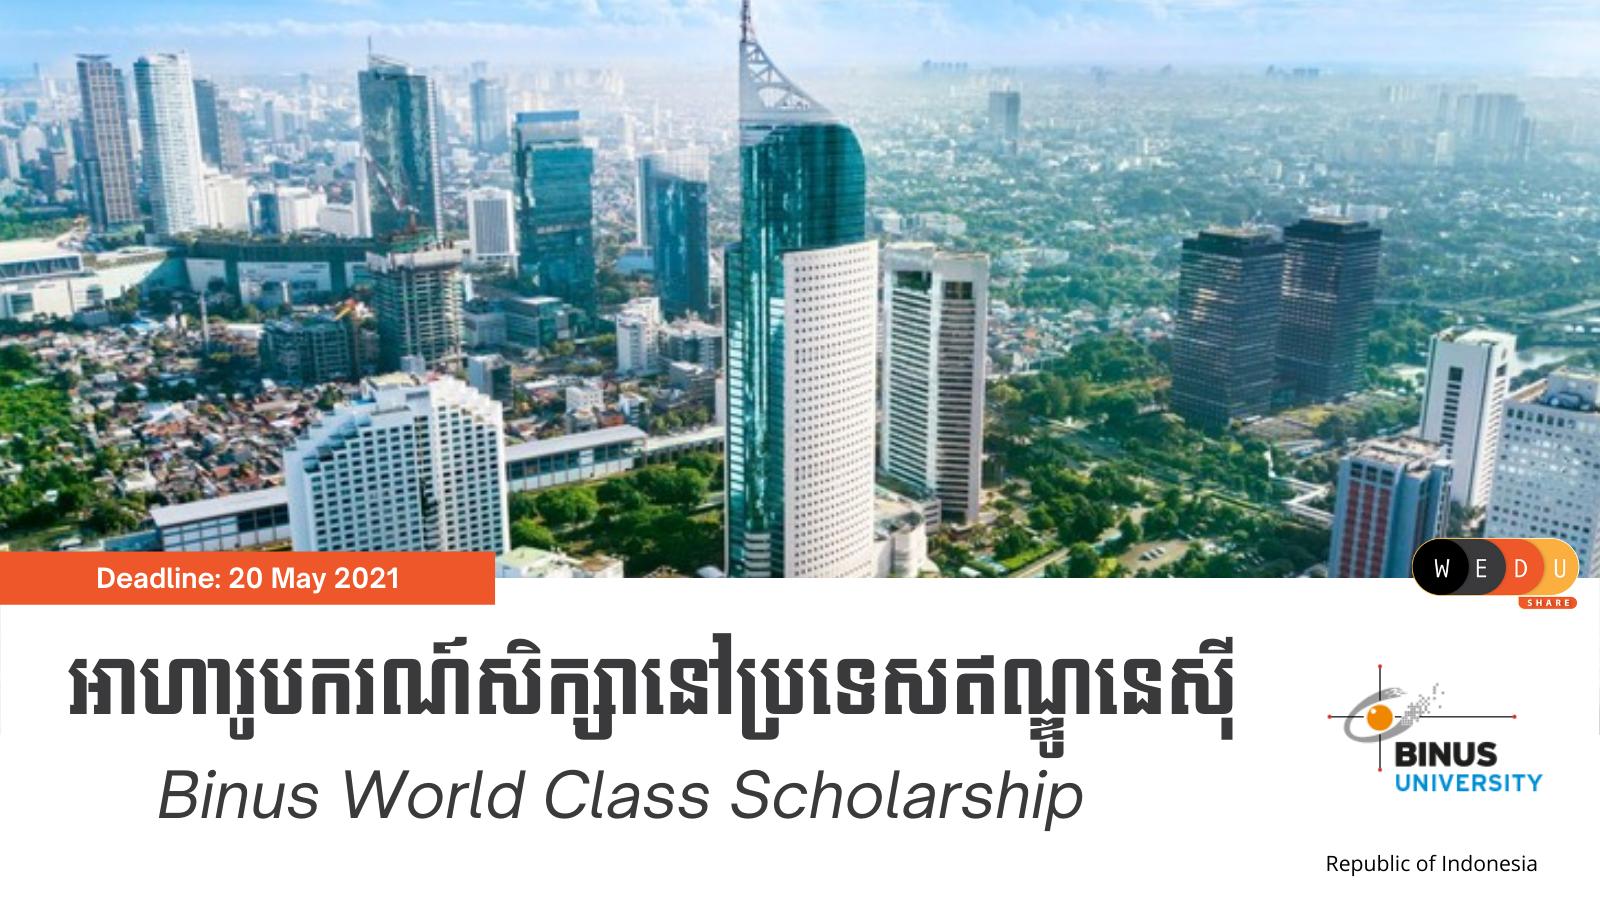 Binus World Class Scholarship